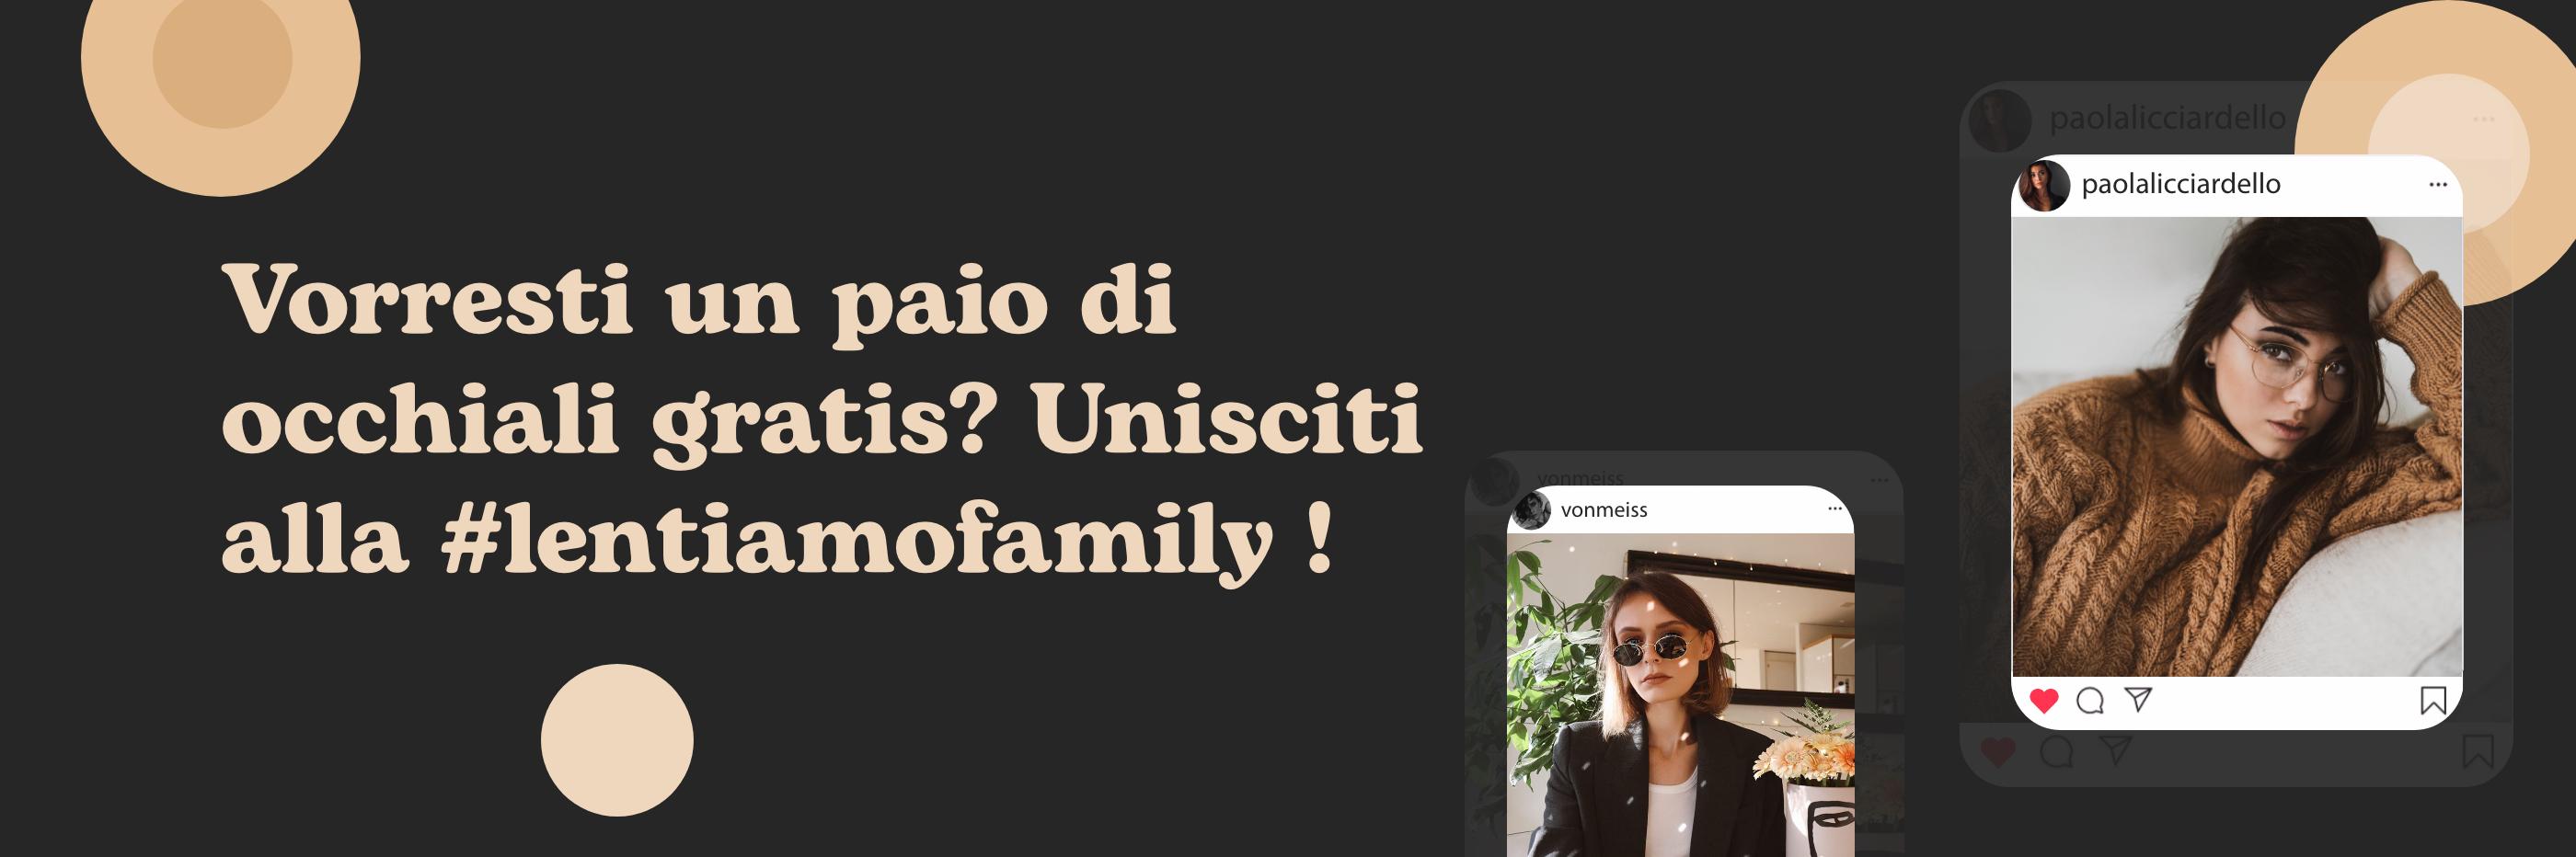 Unisciti alla #lentiamofamily